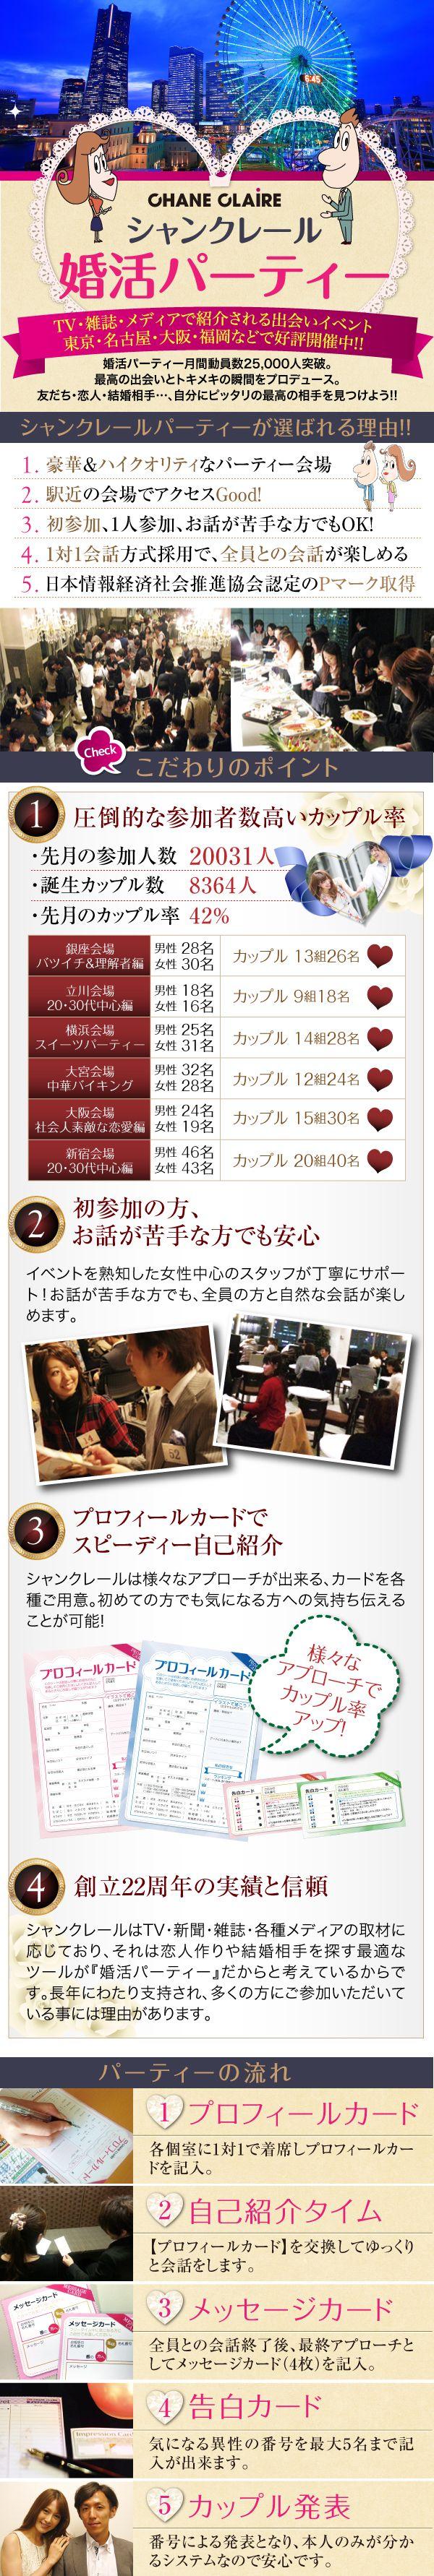 2016婚活ベース_横浜個室